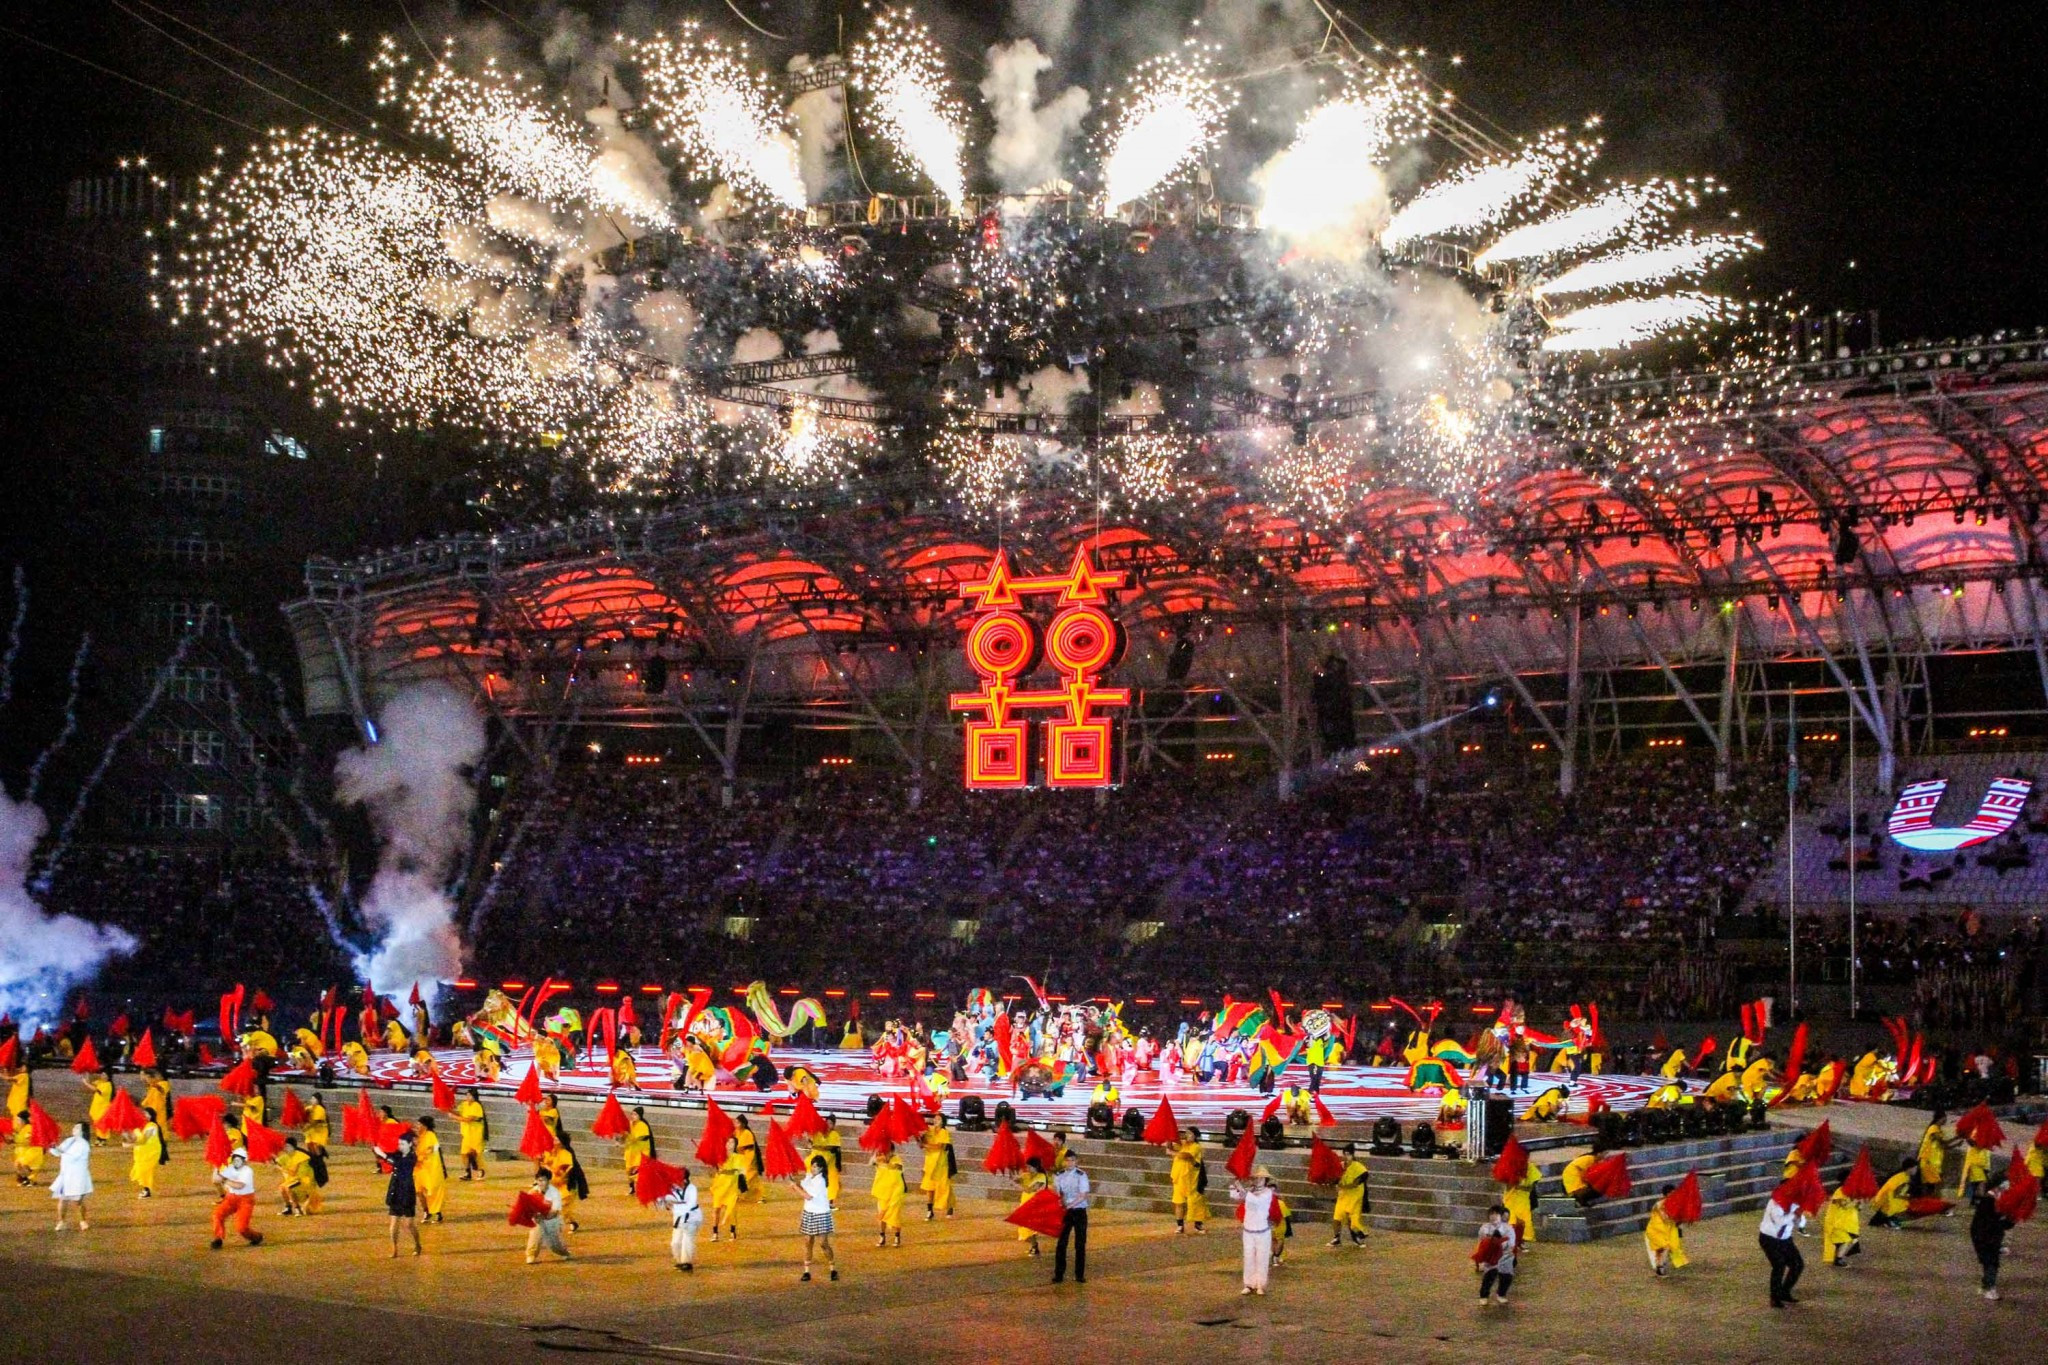 Malaysia won seven medals at Taipei 2017 ©Taipei 2017